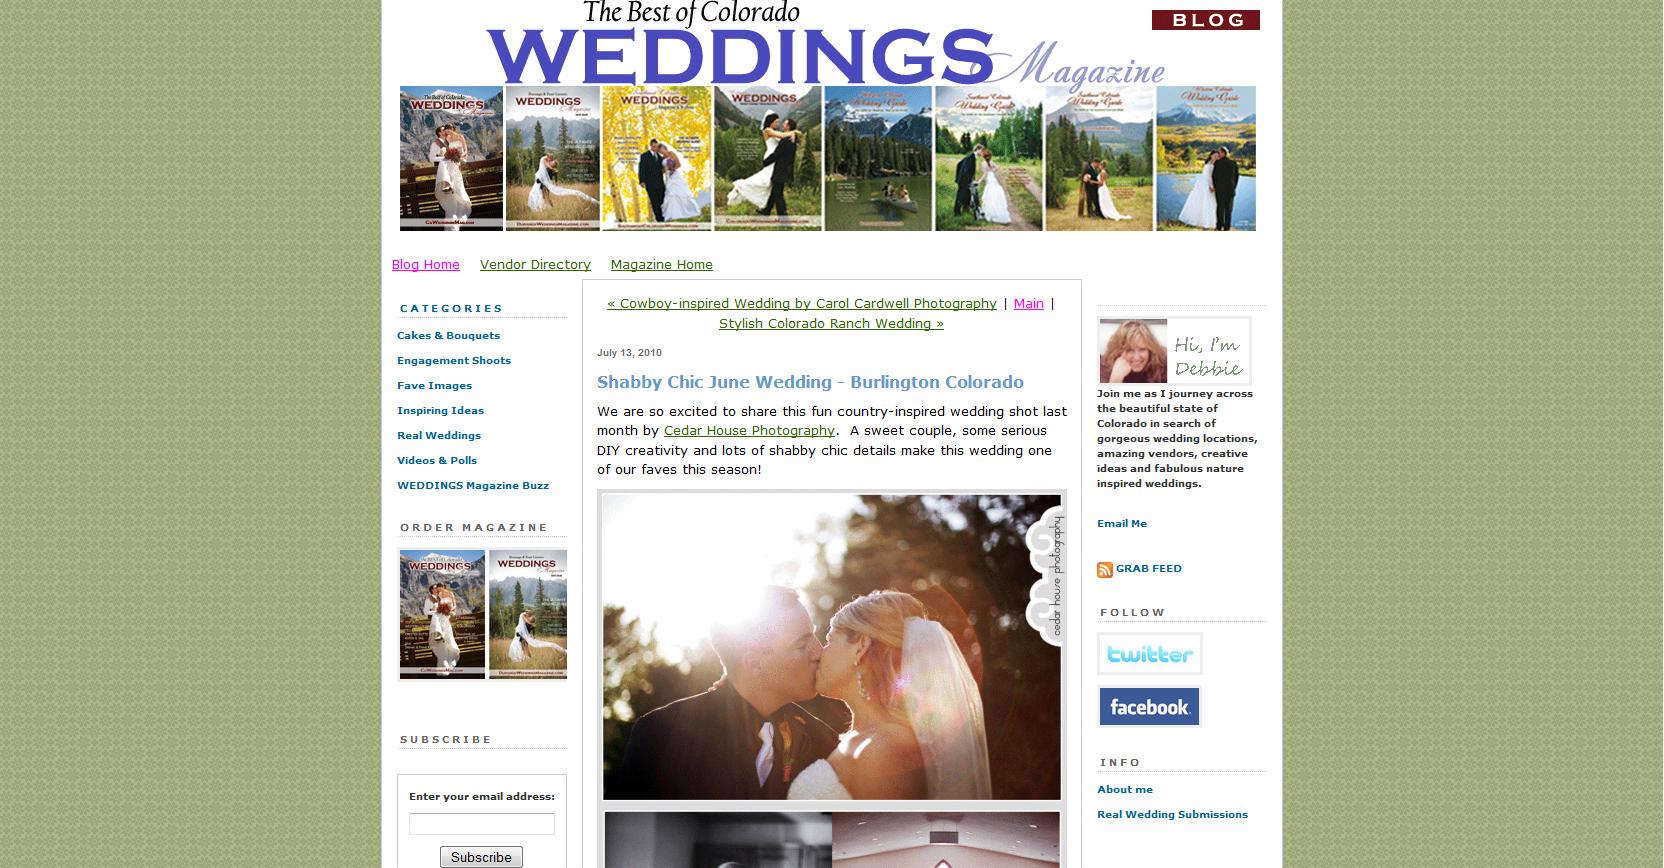 http://www.coloradoweddingsblog.com/coloradoweddings/2010/07/shabbychic-colorado-wedding.html